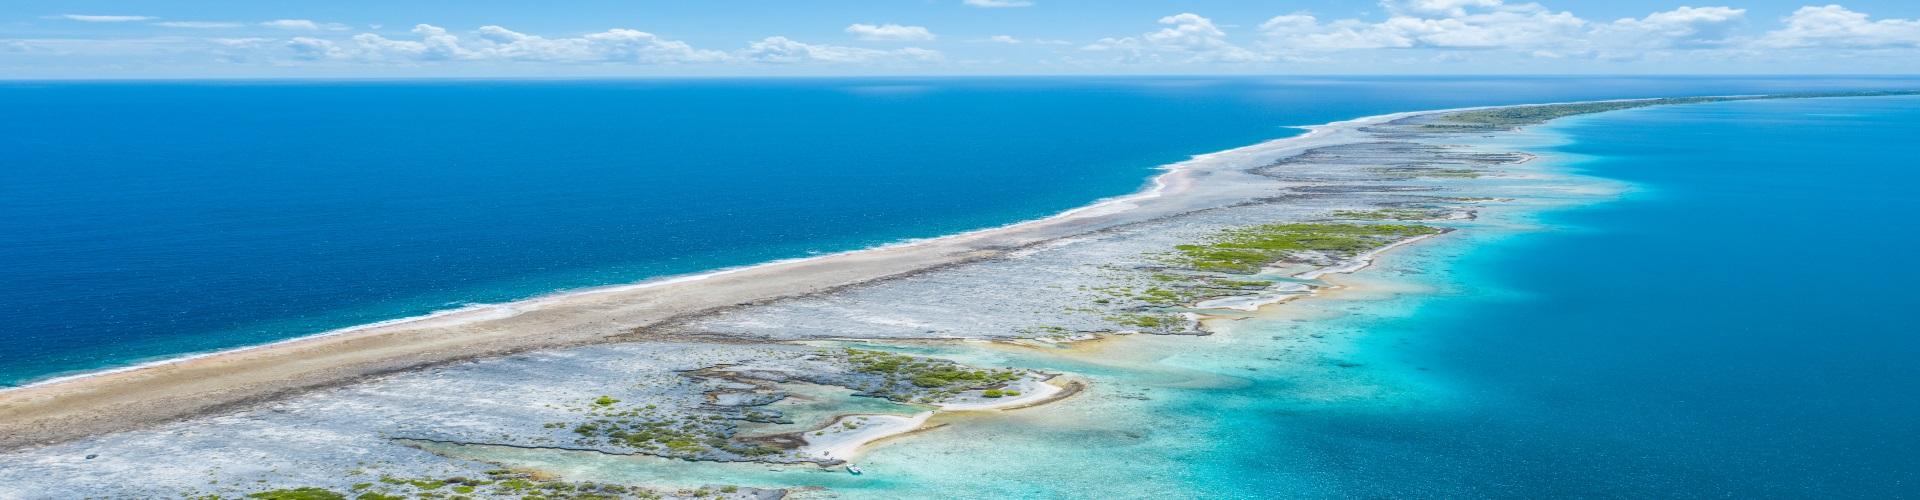 https://tahititourisme.fr/wp-content/uploads/2020/09/Atoll.jpg